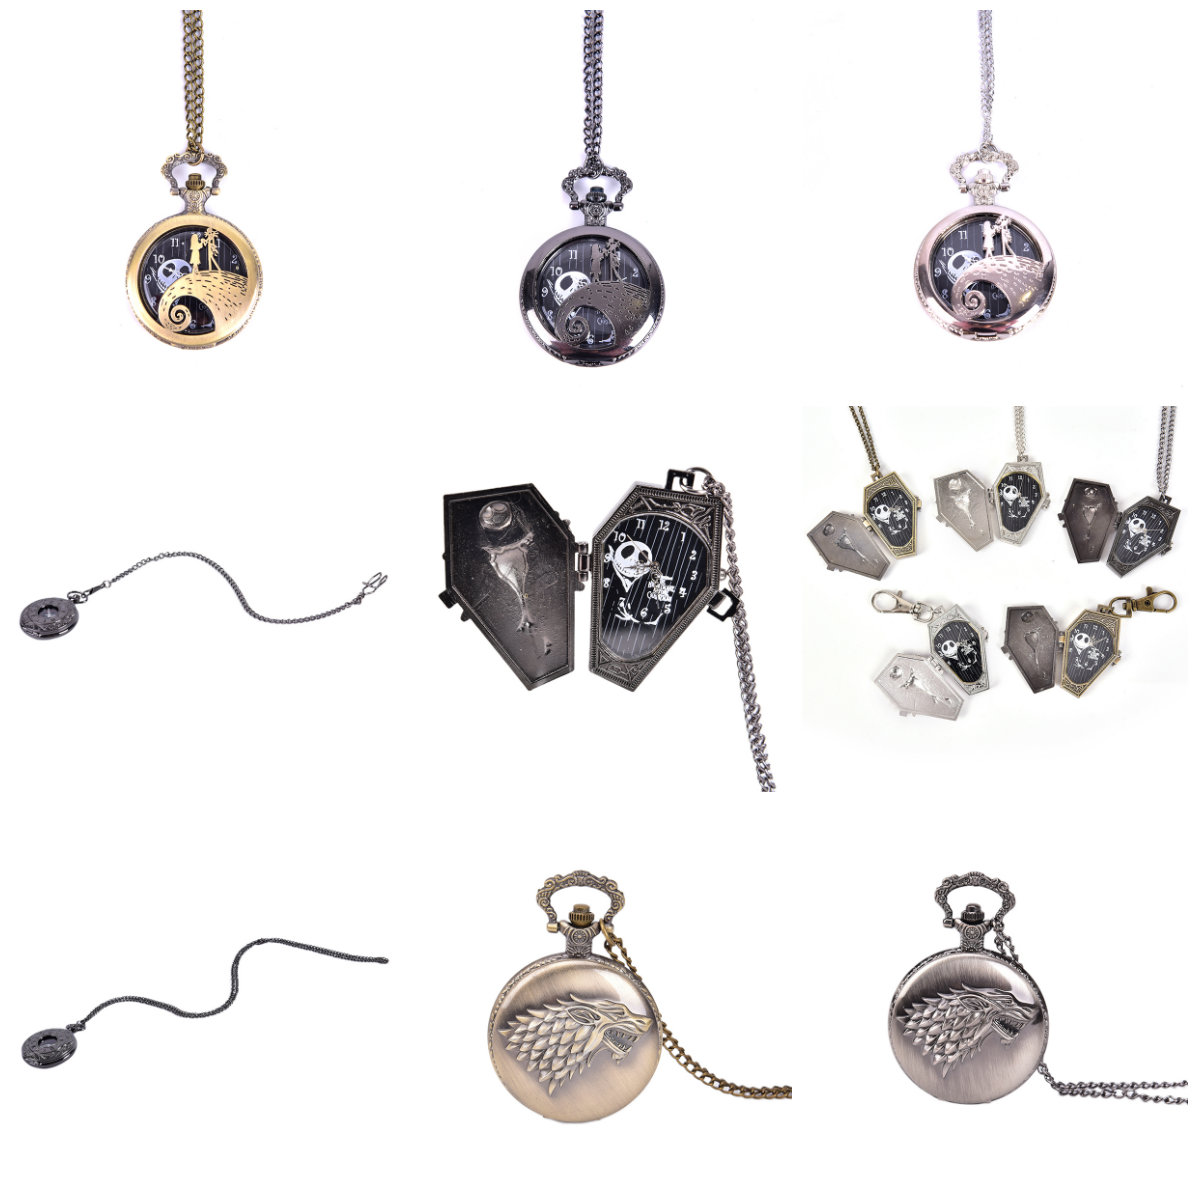 Antique Nightmare Before Christmas Quartz Pocket Watch Pendant Retro Bronze Jewelry Fob Necklace Watches